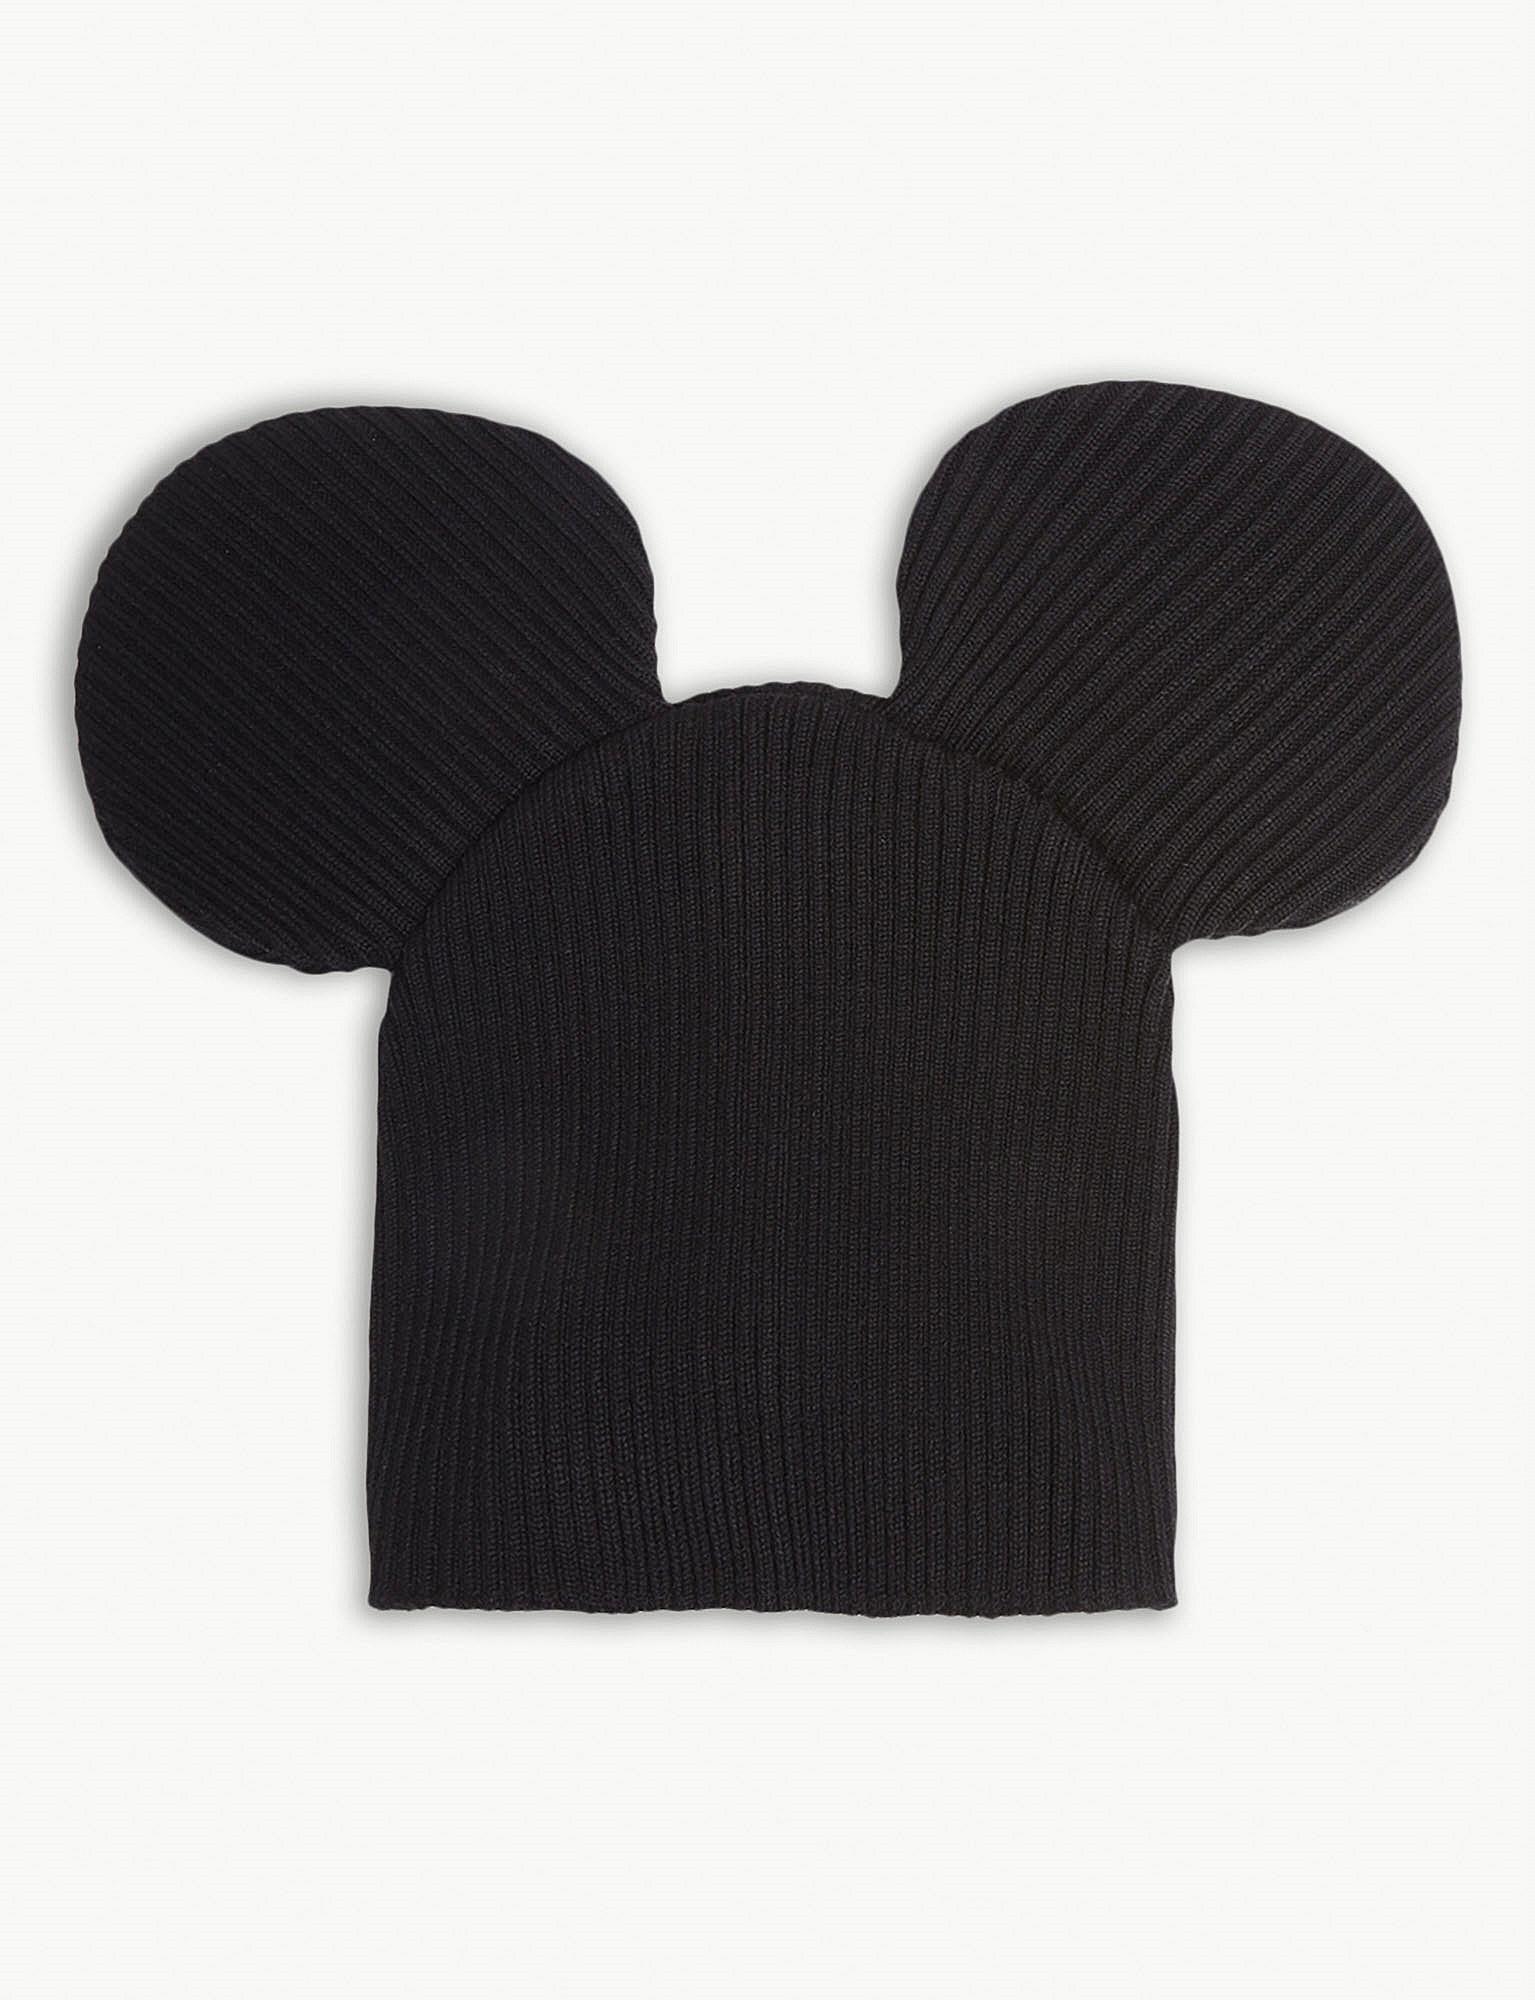 3374503f8ef Comme Des Garçons Mouse Ears Beanie in Black for Men - Lyst